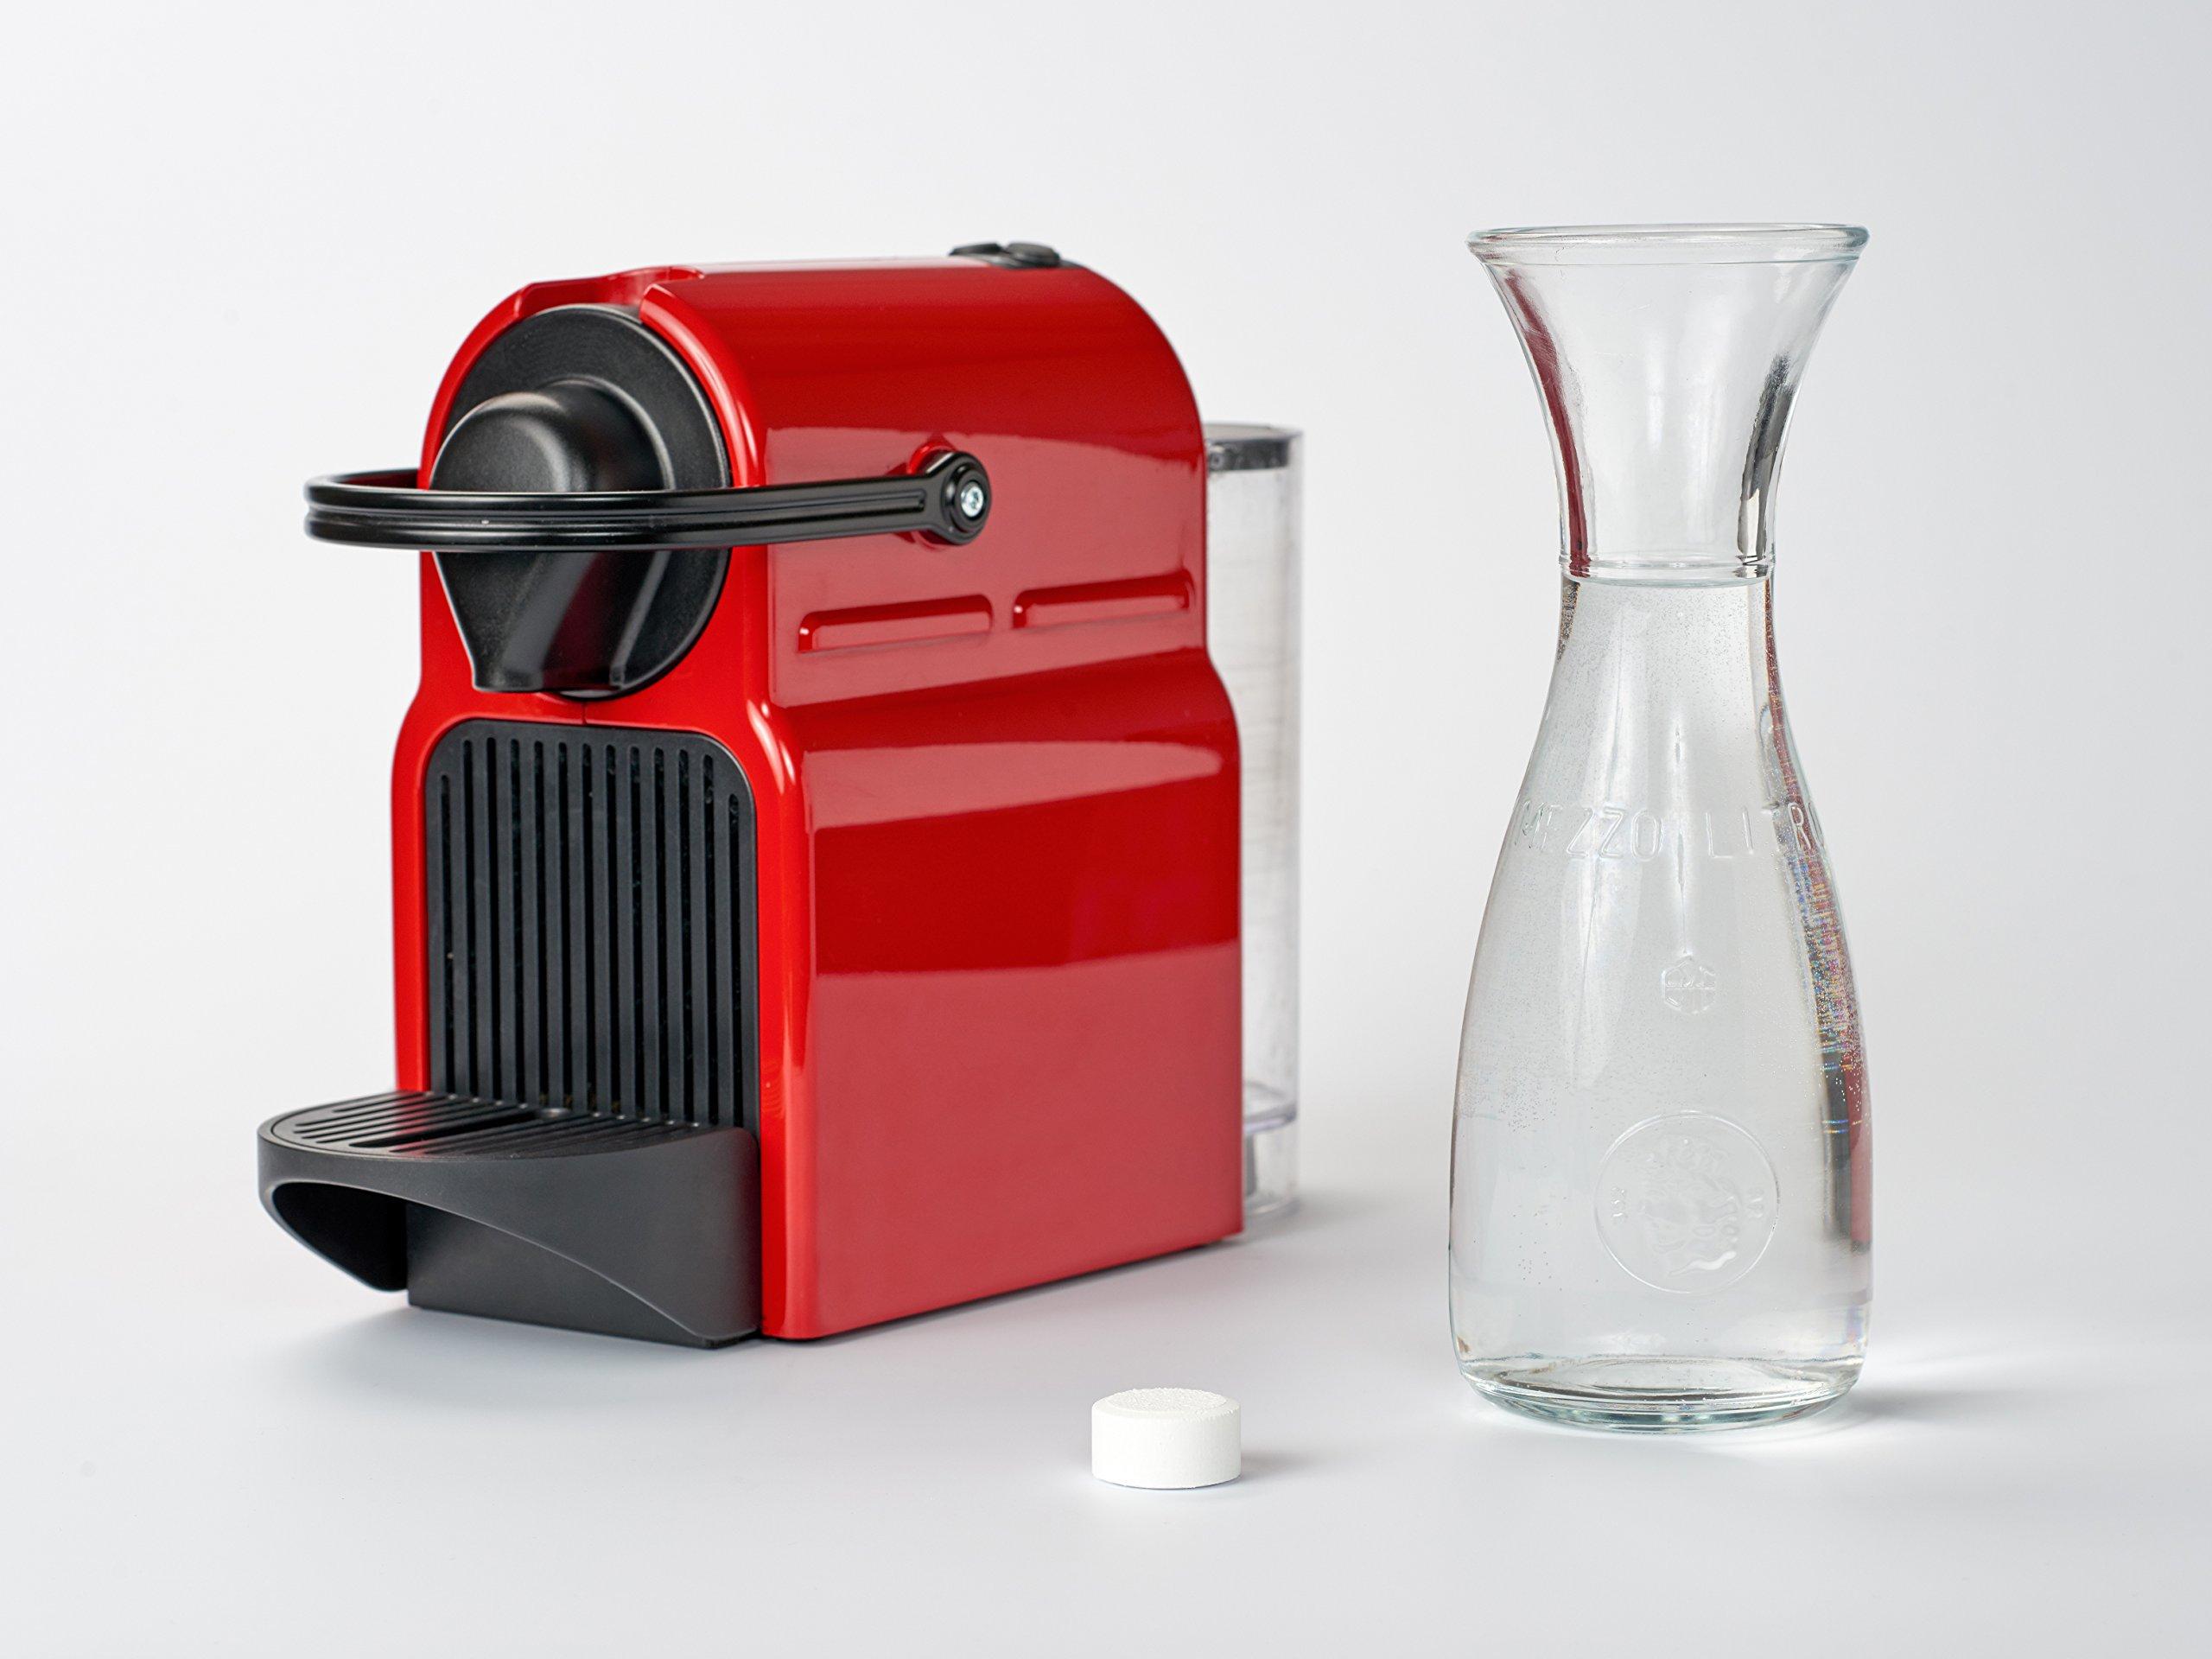 18 pastiglie anticalcare di culiclean per macchine da caffé e elettrodomestici